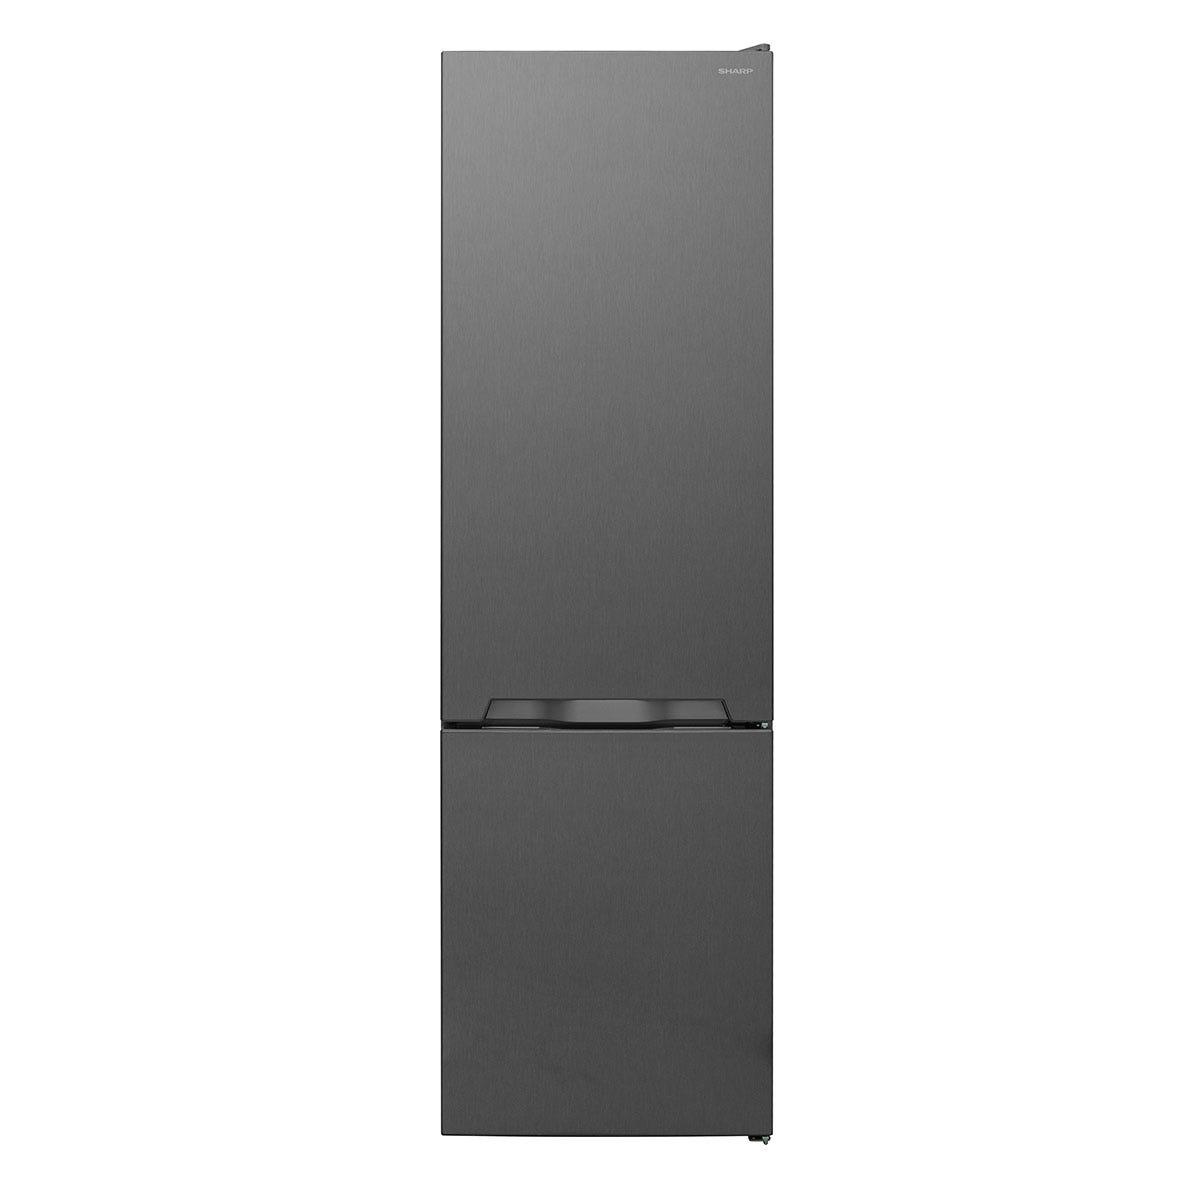 Sharp SJ-BB05DTXL1-EN FS Combi 70/30 Fridge Freezer with NanoFrost Technology - Linox